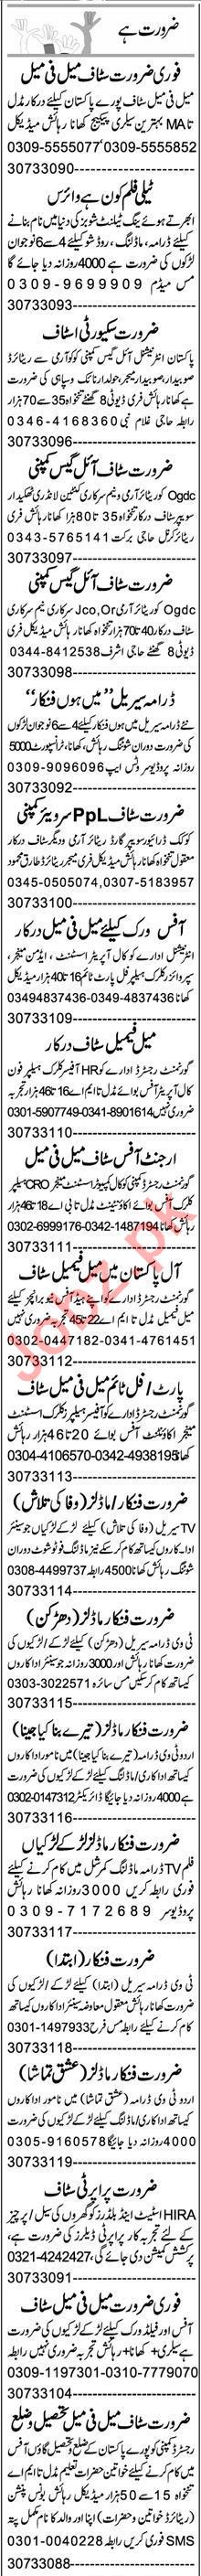 Web Developer & Assistant Supervisor Jobs 2020 in Lahore